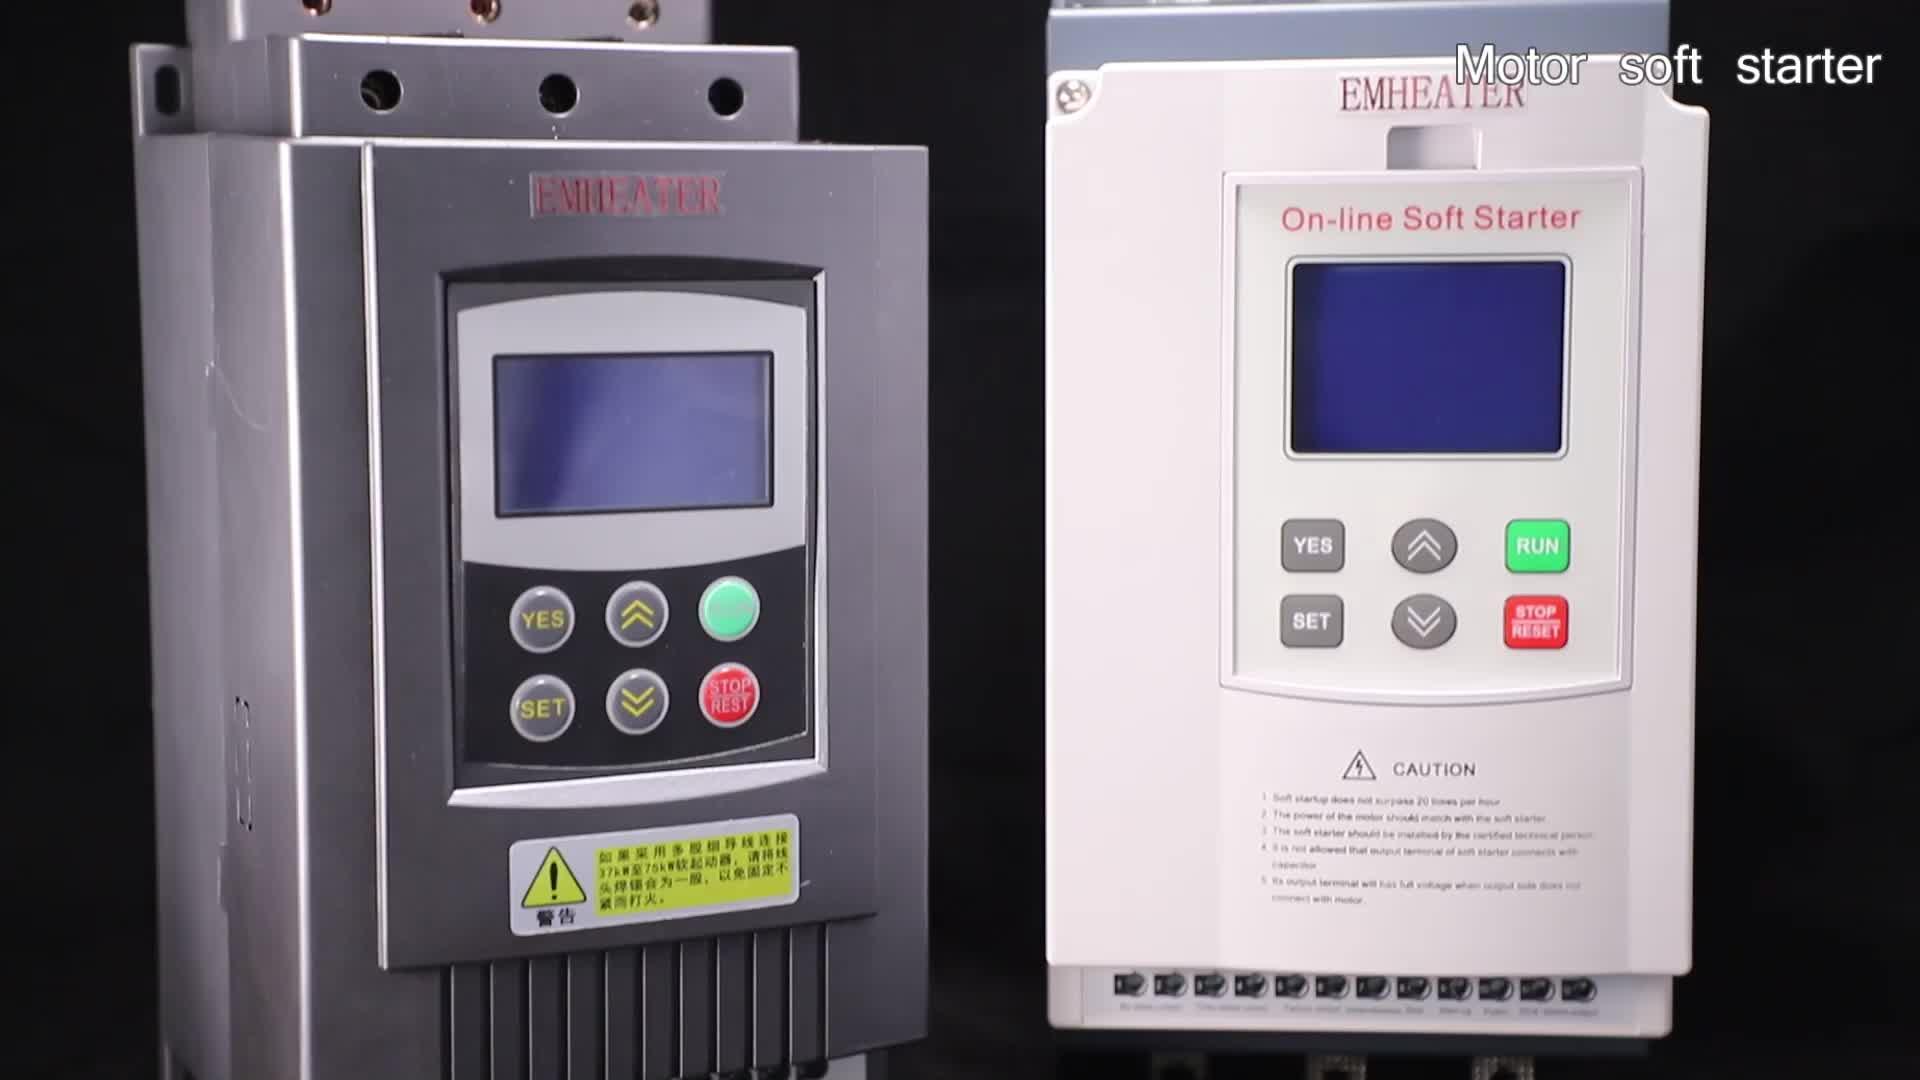 popular in Chile SOFT STARTER 440-480V 15KW for extruding machine